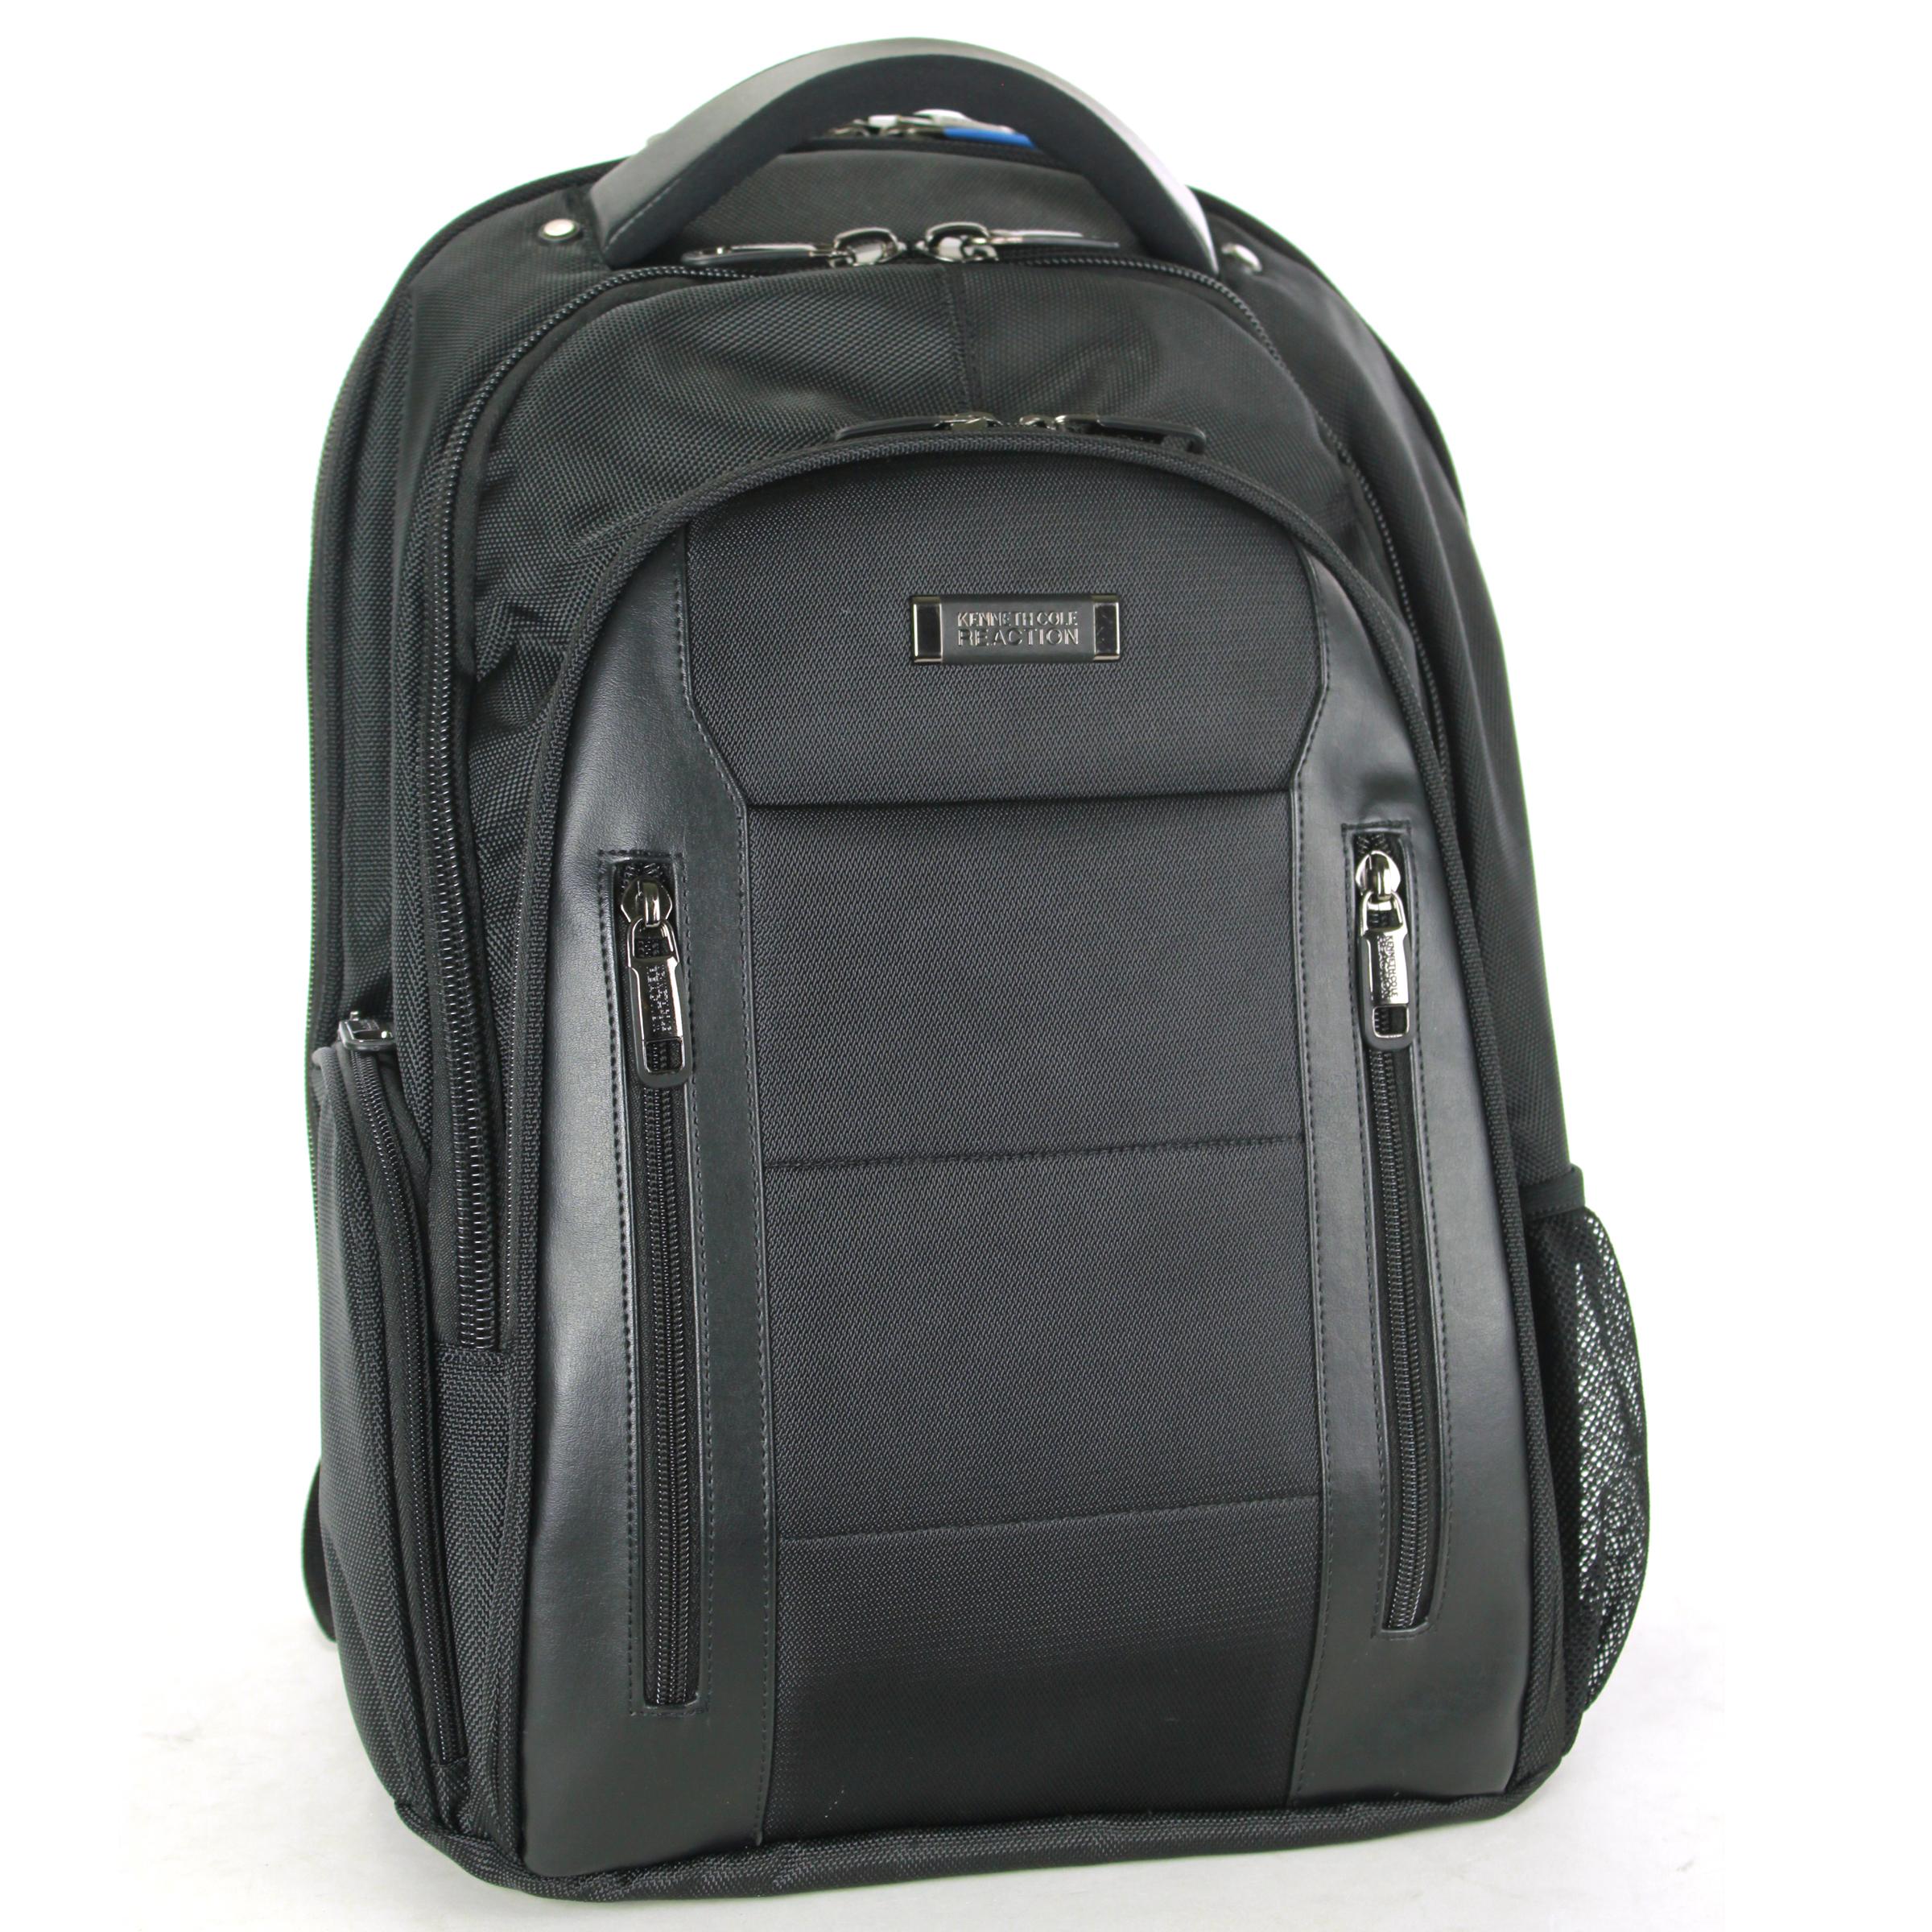 cc45a36cb2b1 Wenger Swissgear Pegasus Backpack For 17 Laptop- Fenix Toulouse Handball